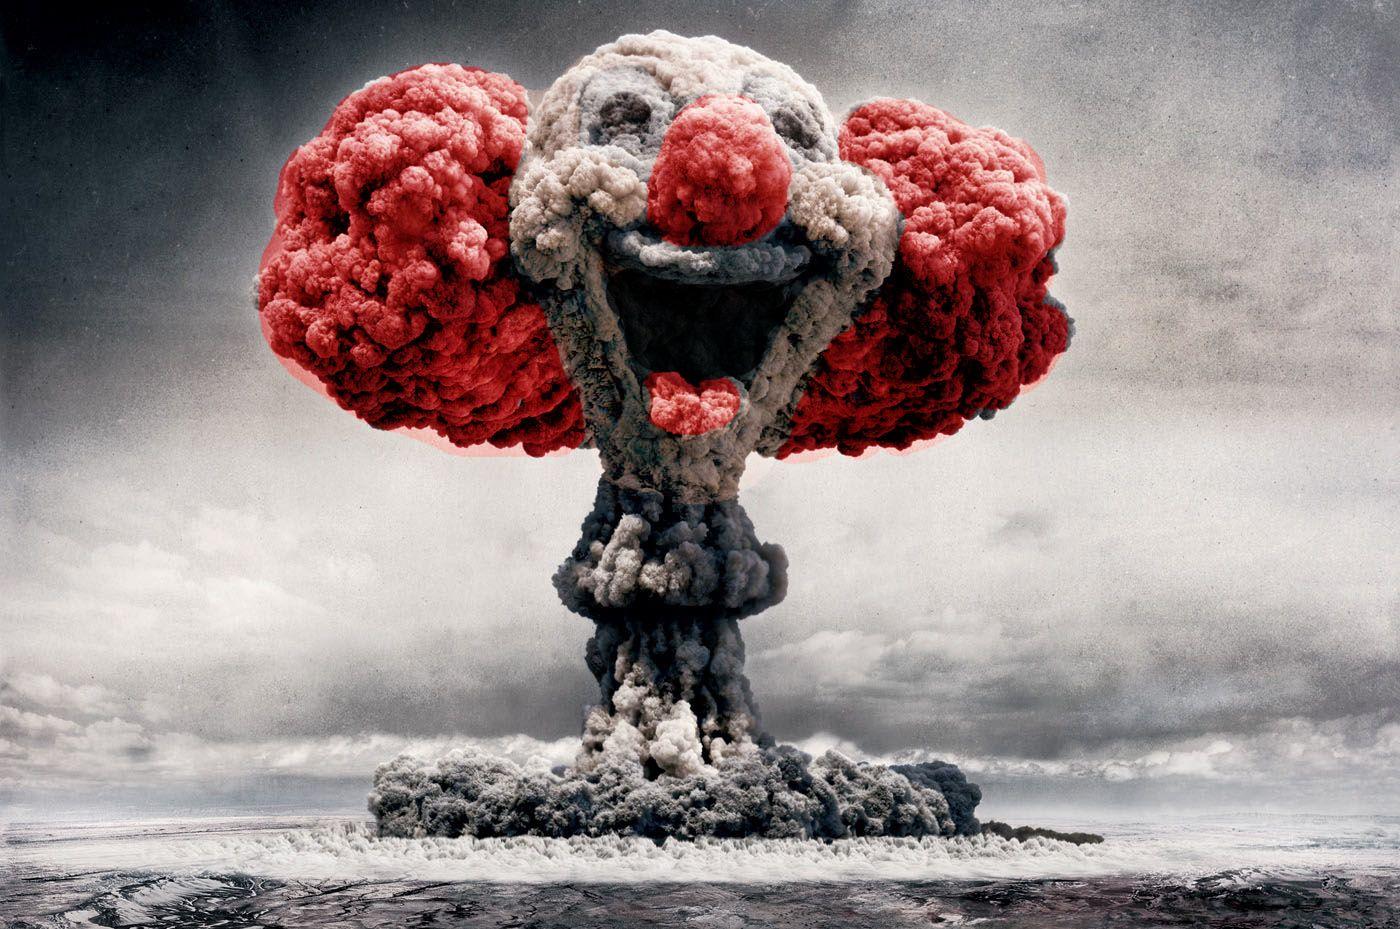 Anon Nuke Colors Clown Ftw Wallpaper 69708 Wallbase Cc Photo Manipulation Art Evil Clowns Political Artwork